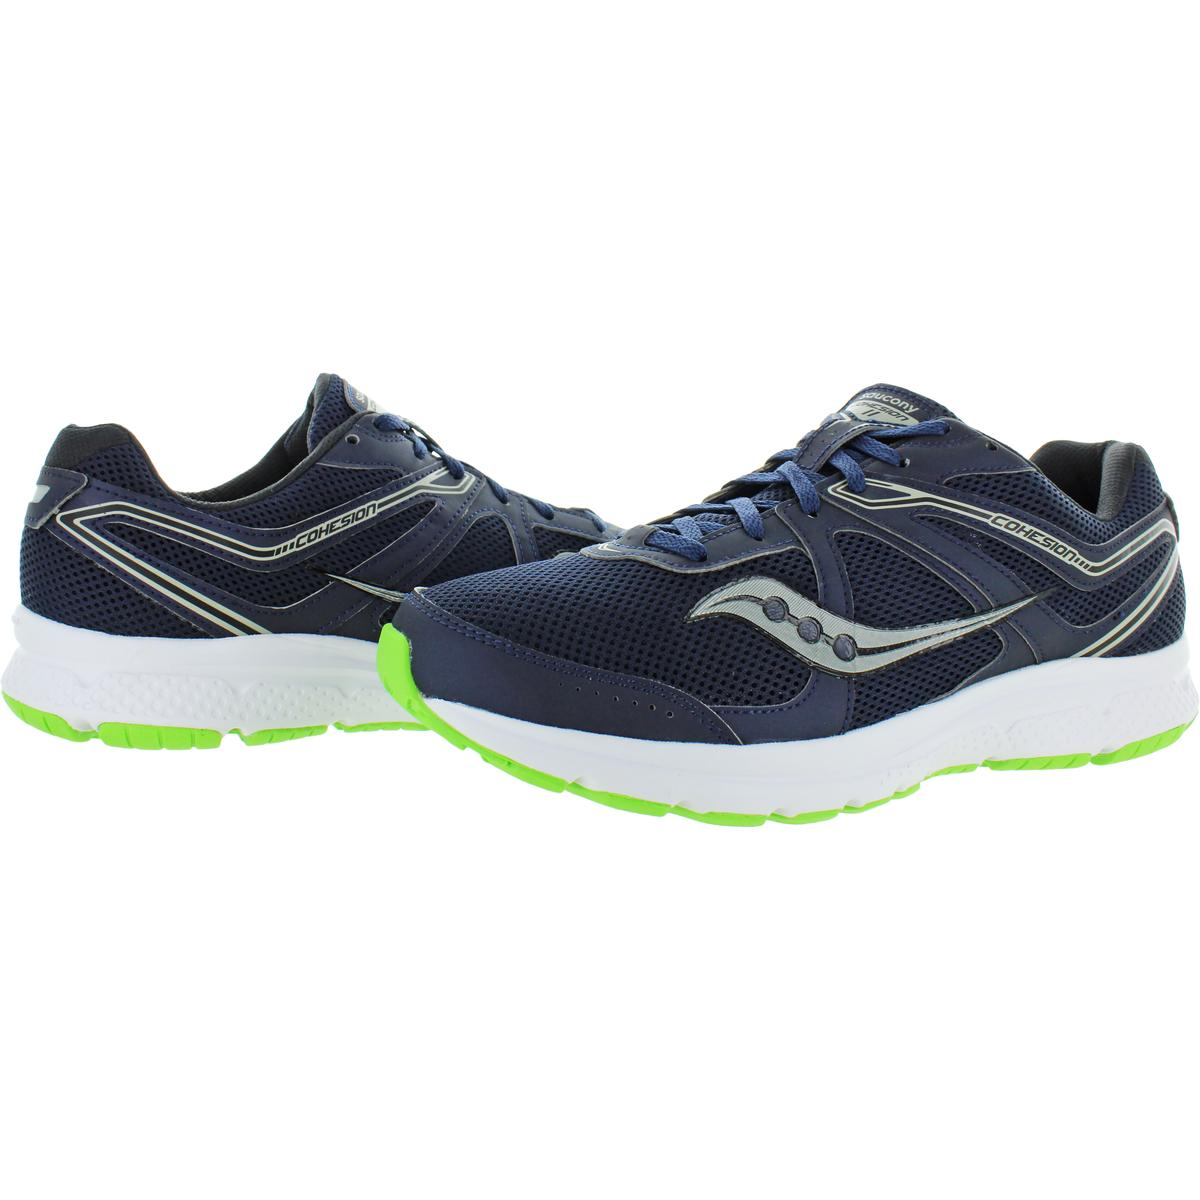 Saucony-Herren-Grid-Kohaesions-11-Ubung-Fitness-Laufschuhe-Sneakers-bhfo-2076 Indexbild 8